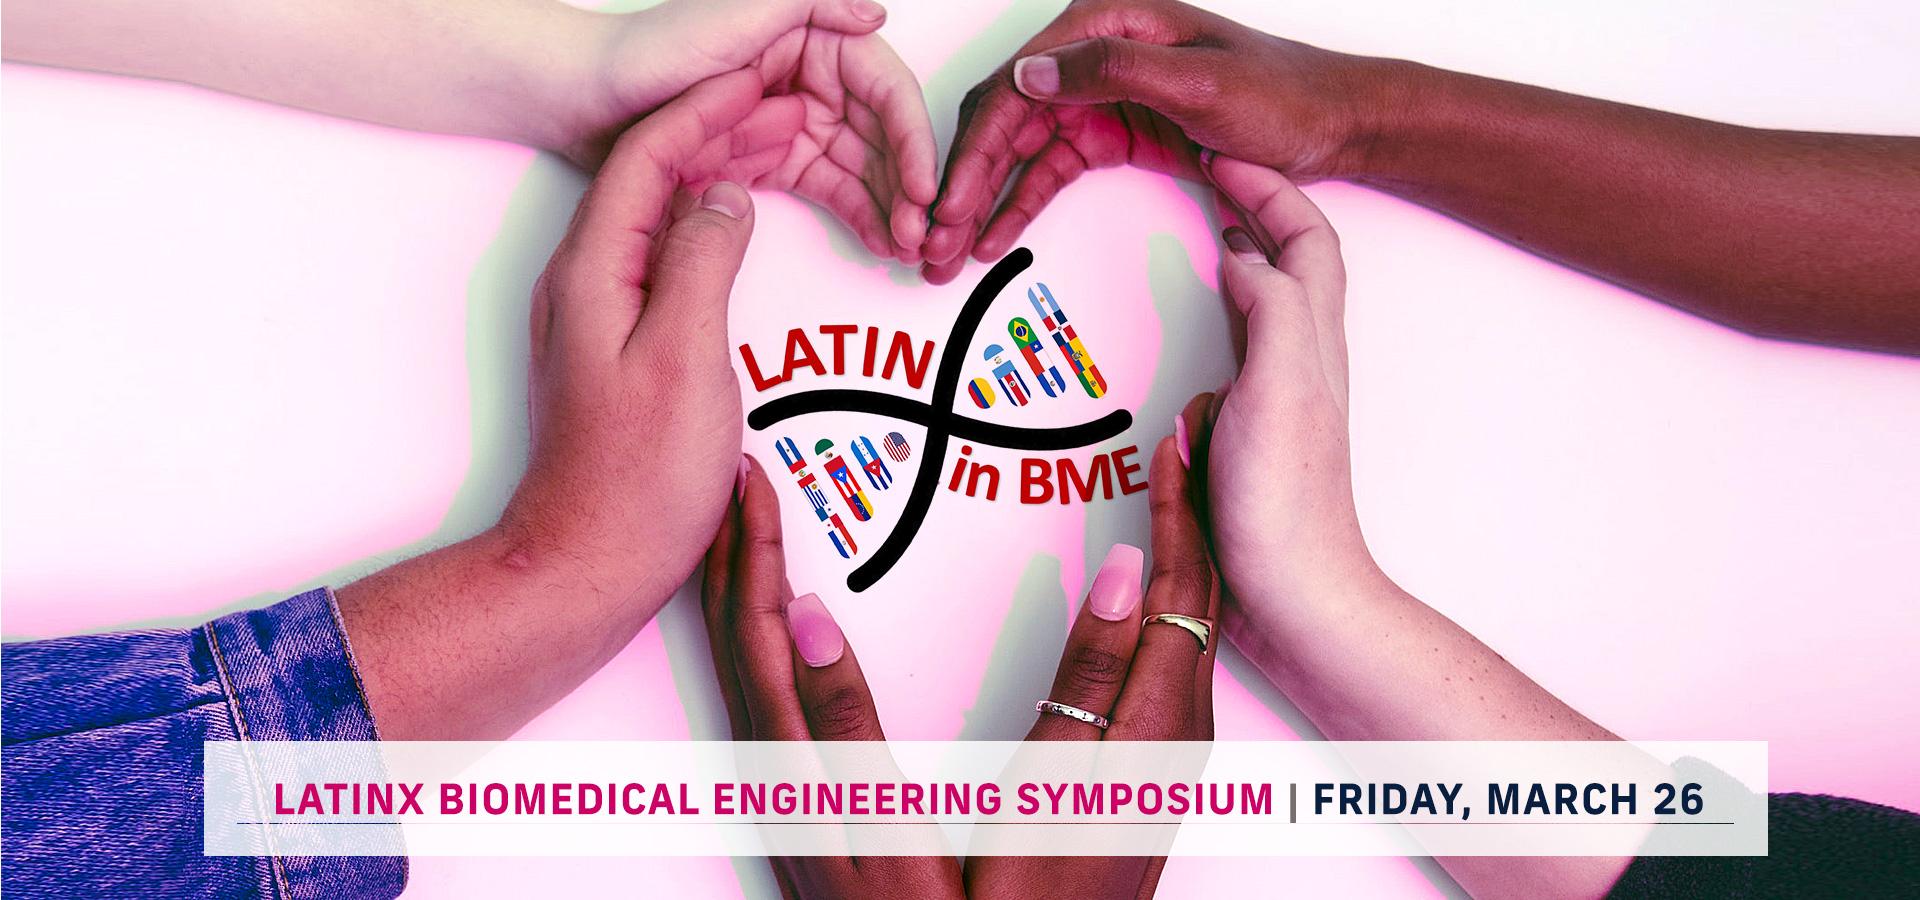 LatinX Biomedical Engineering Symposium at FIU